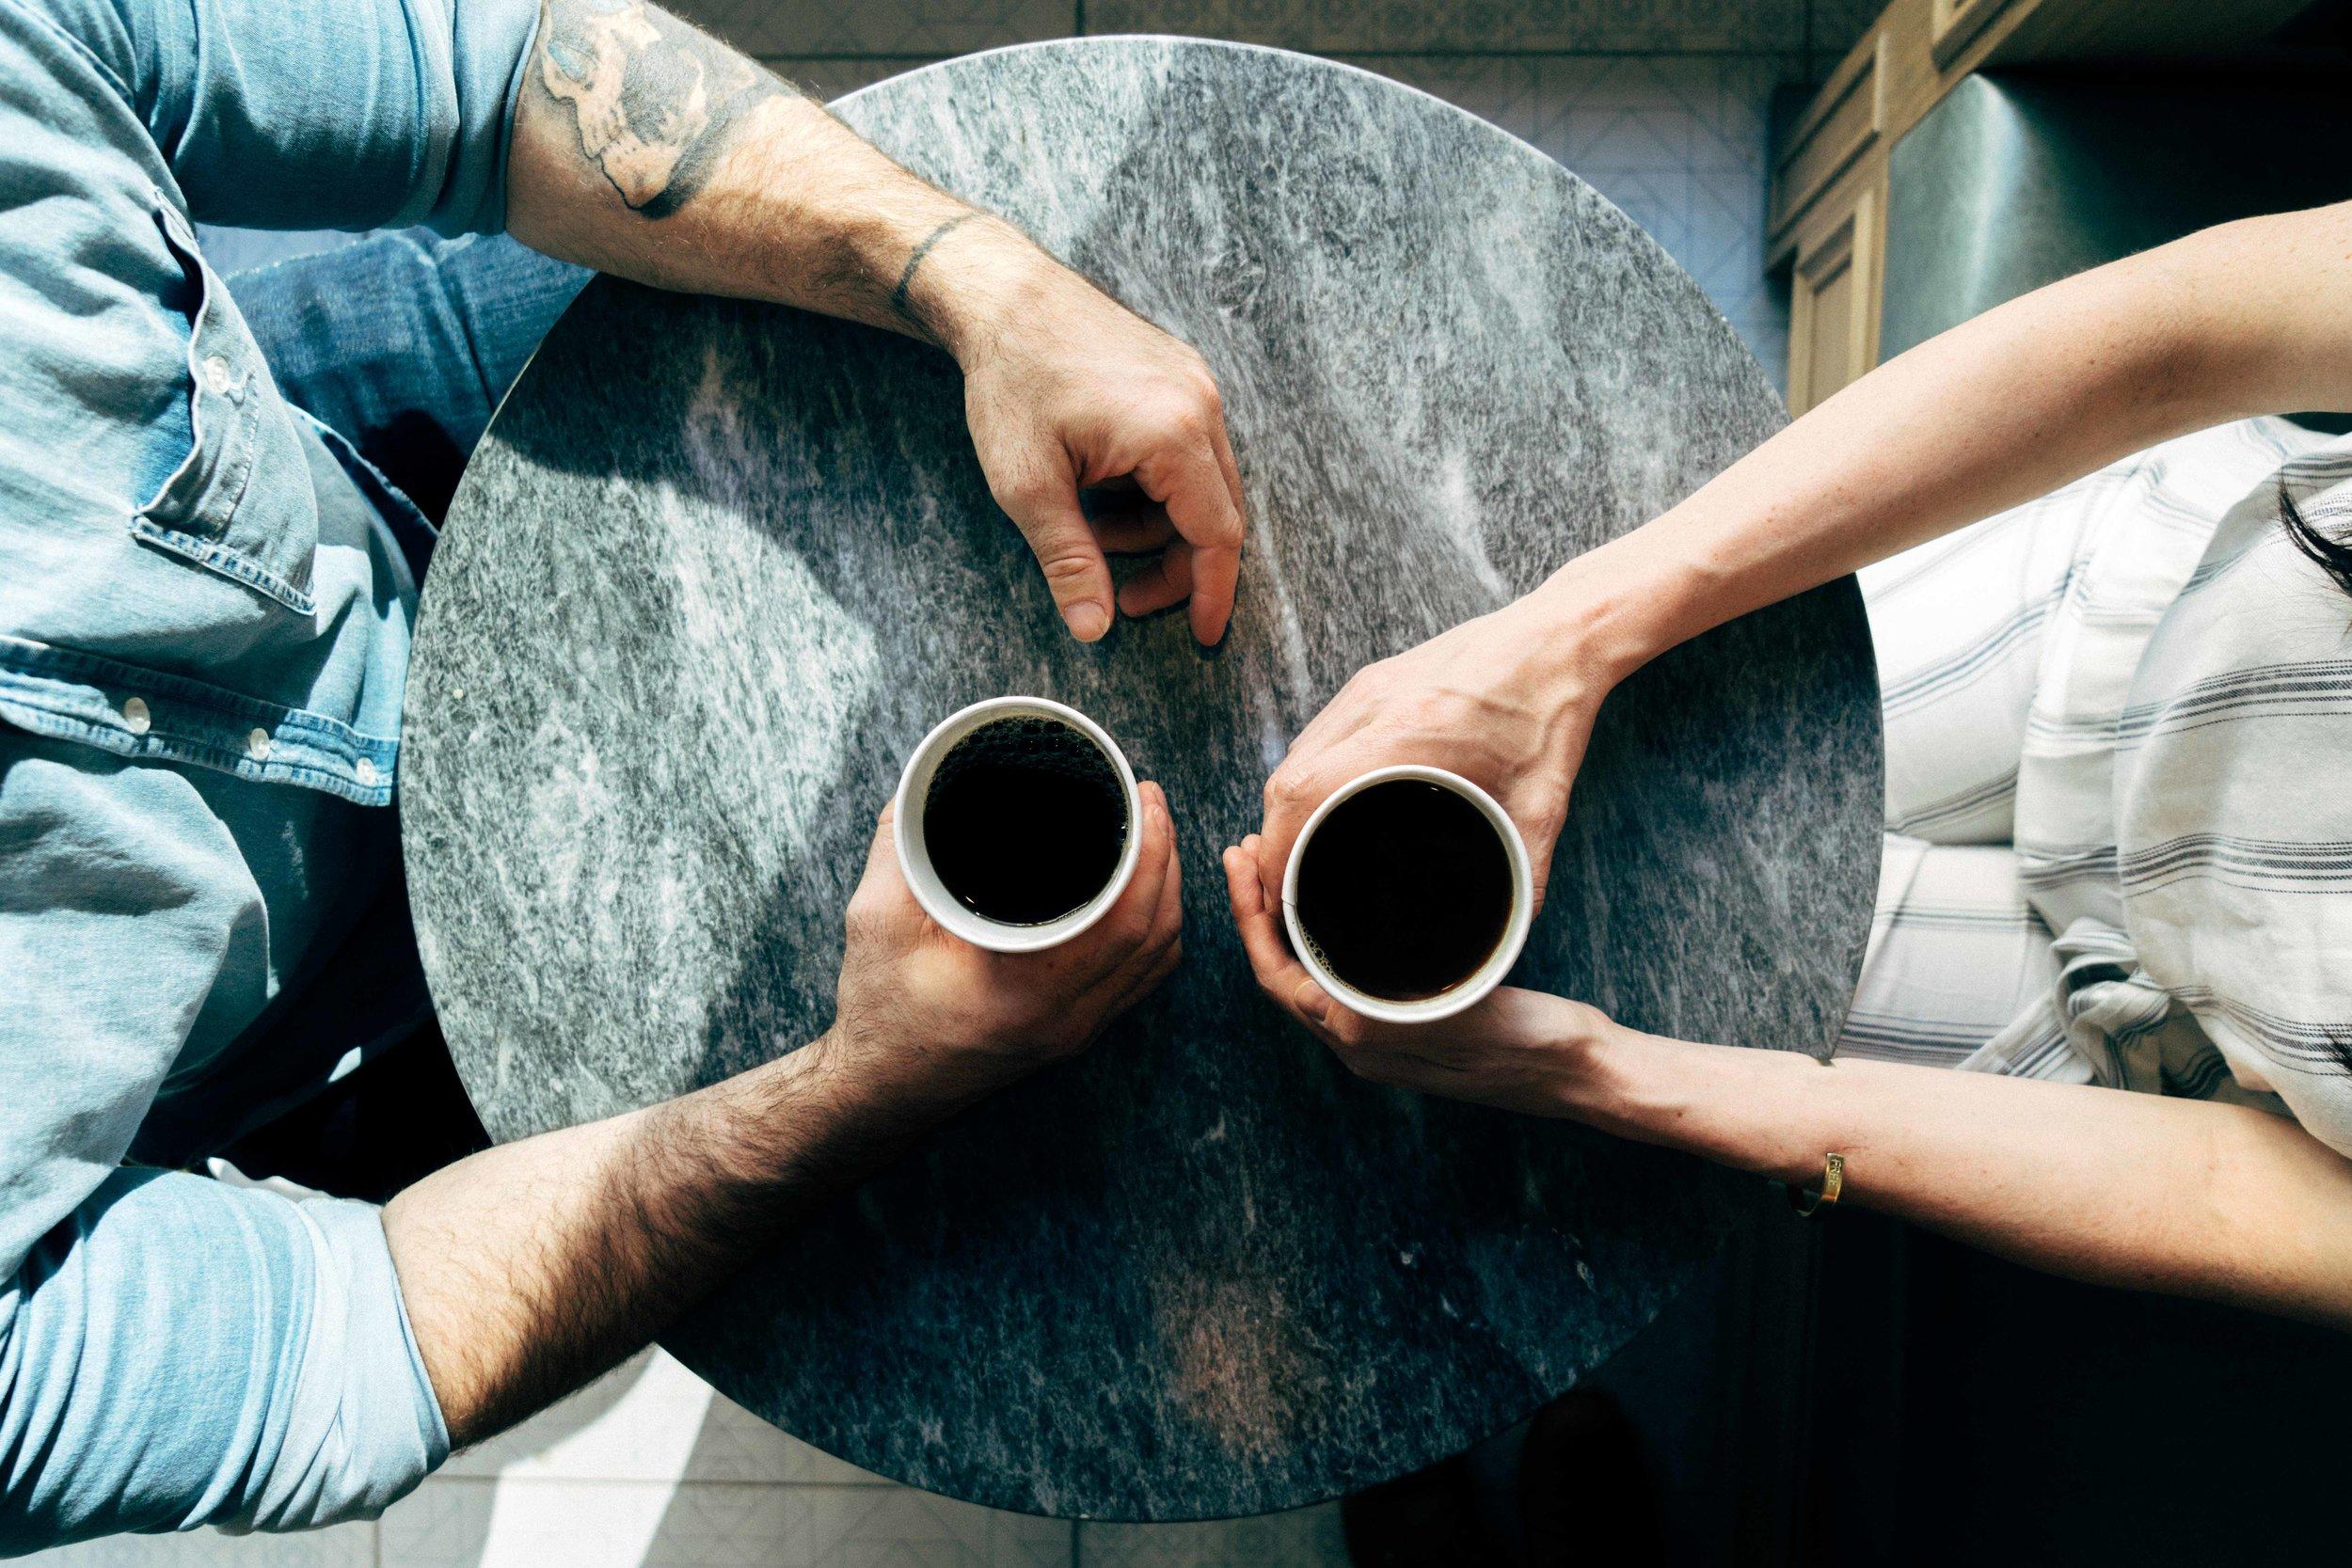 We Speak Relationship. - We Can Help.